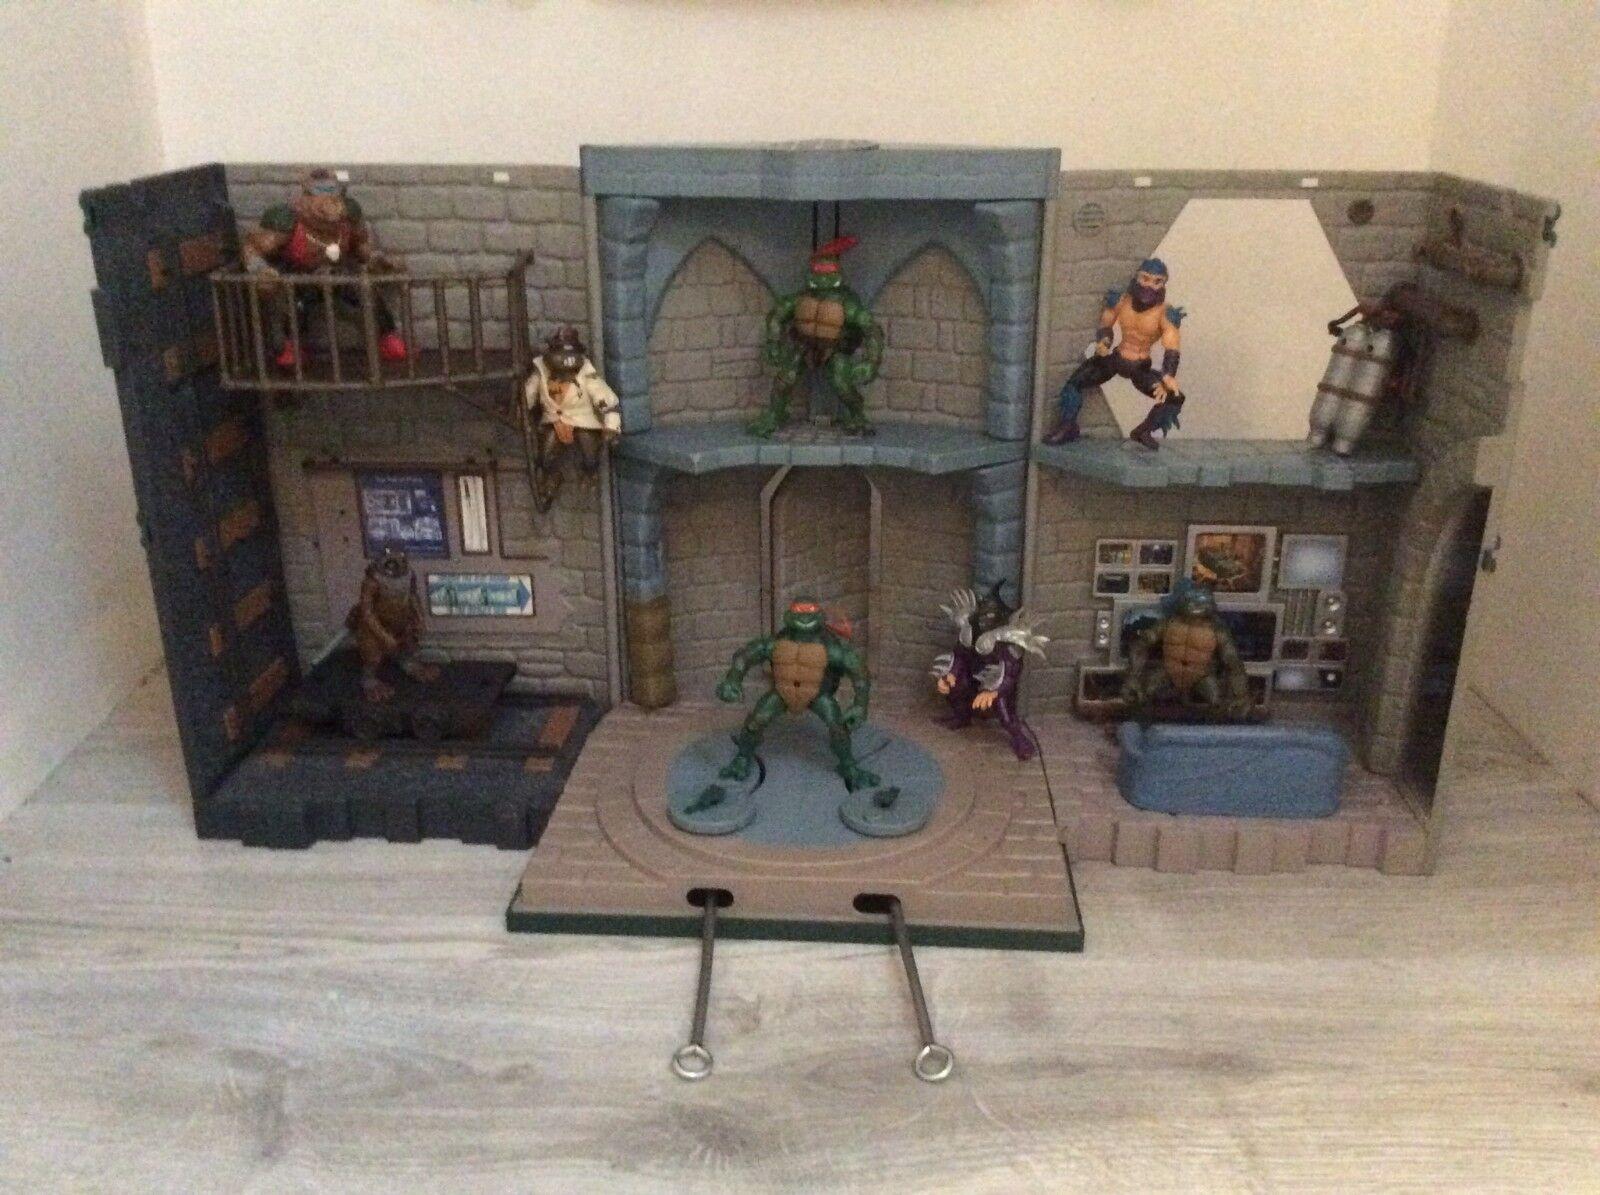 Maison Repaire Tortues Ninja 2003 Mirage Studio Playmates Toys